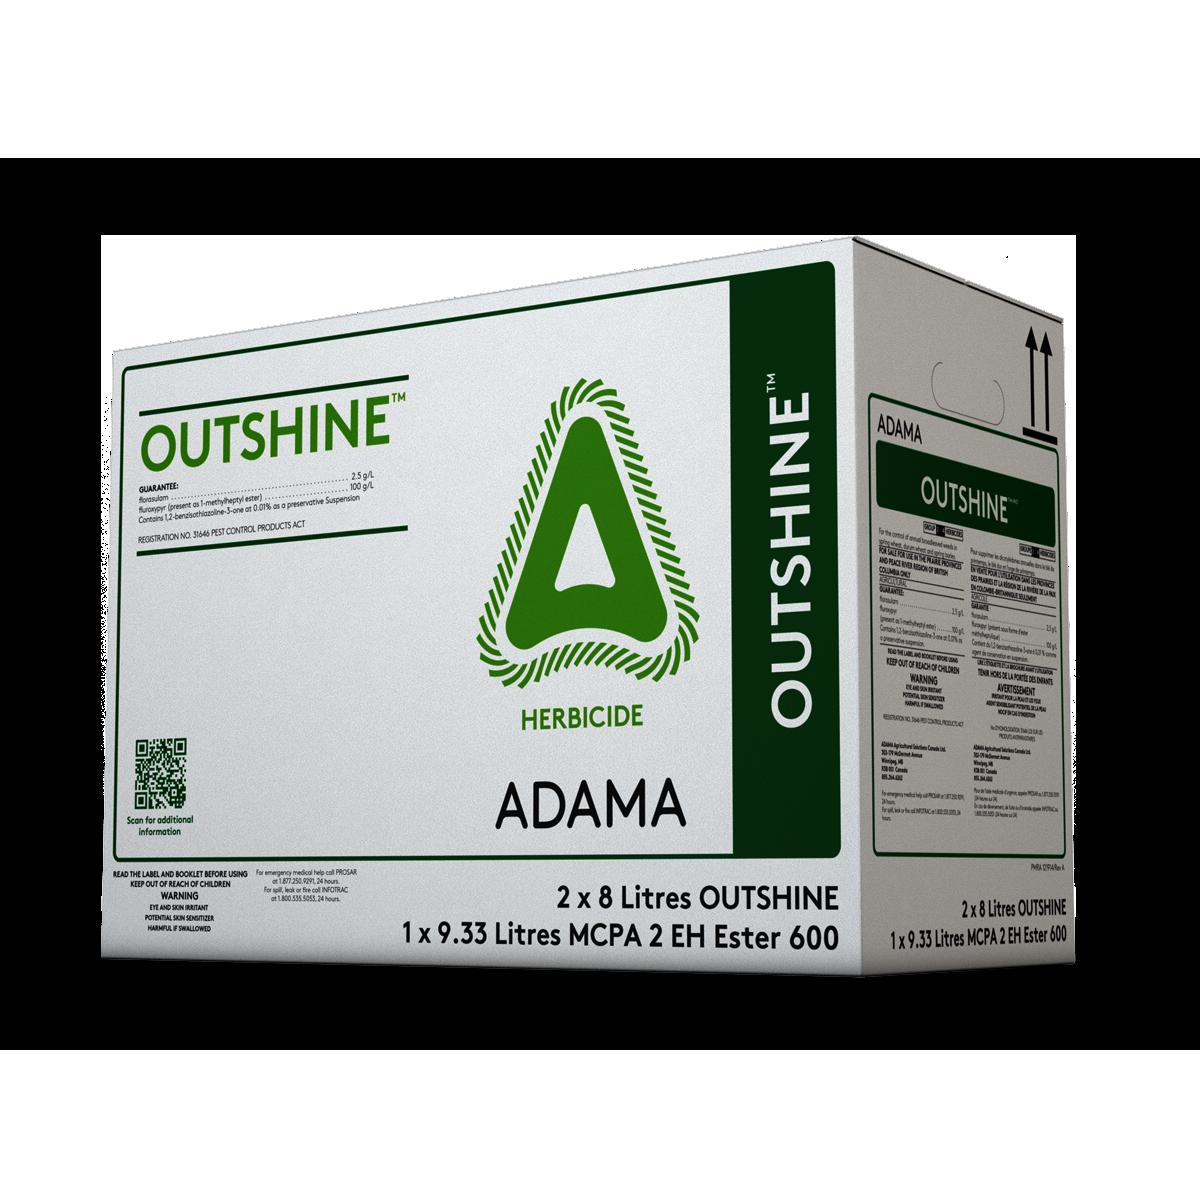 ADAMA-Outshine-outlaw